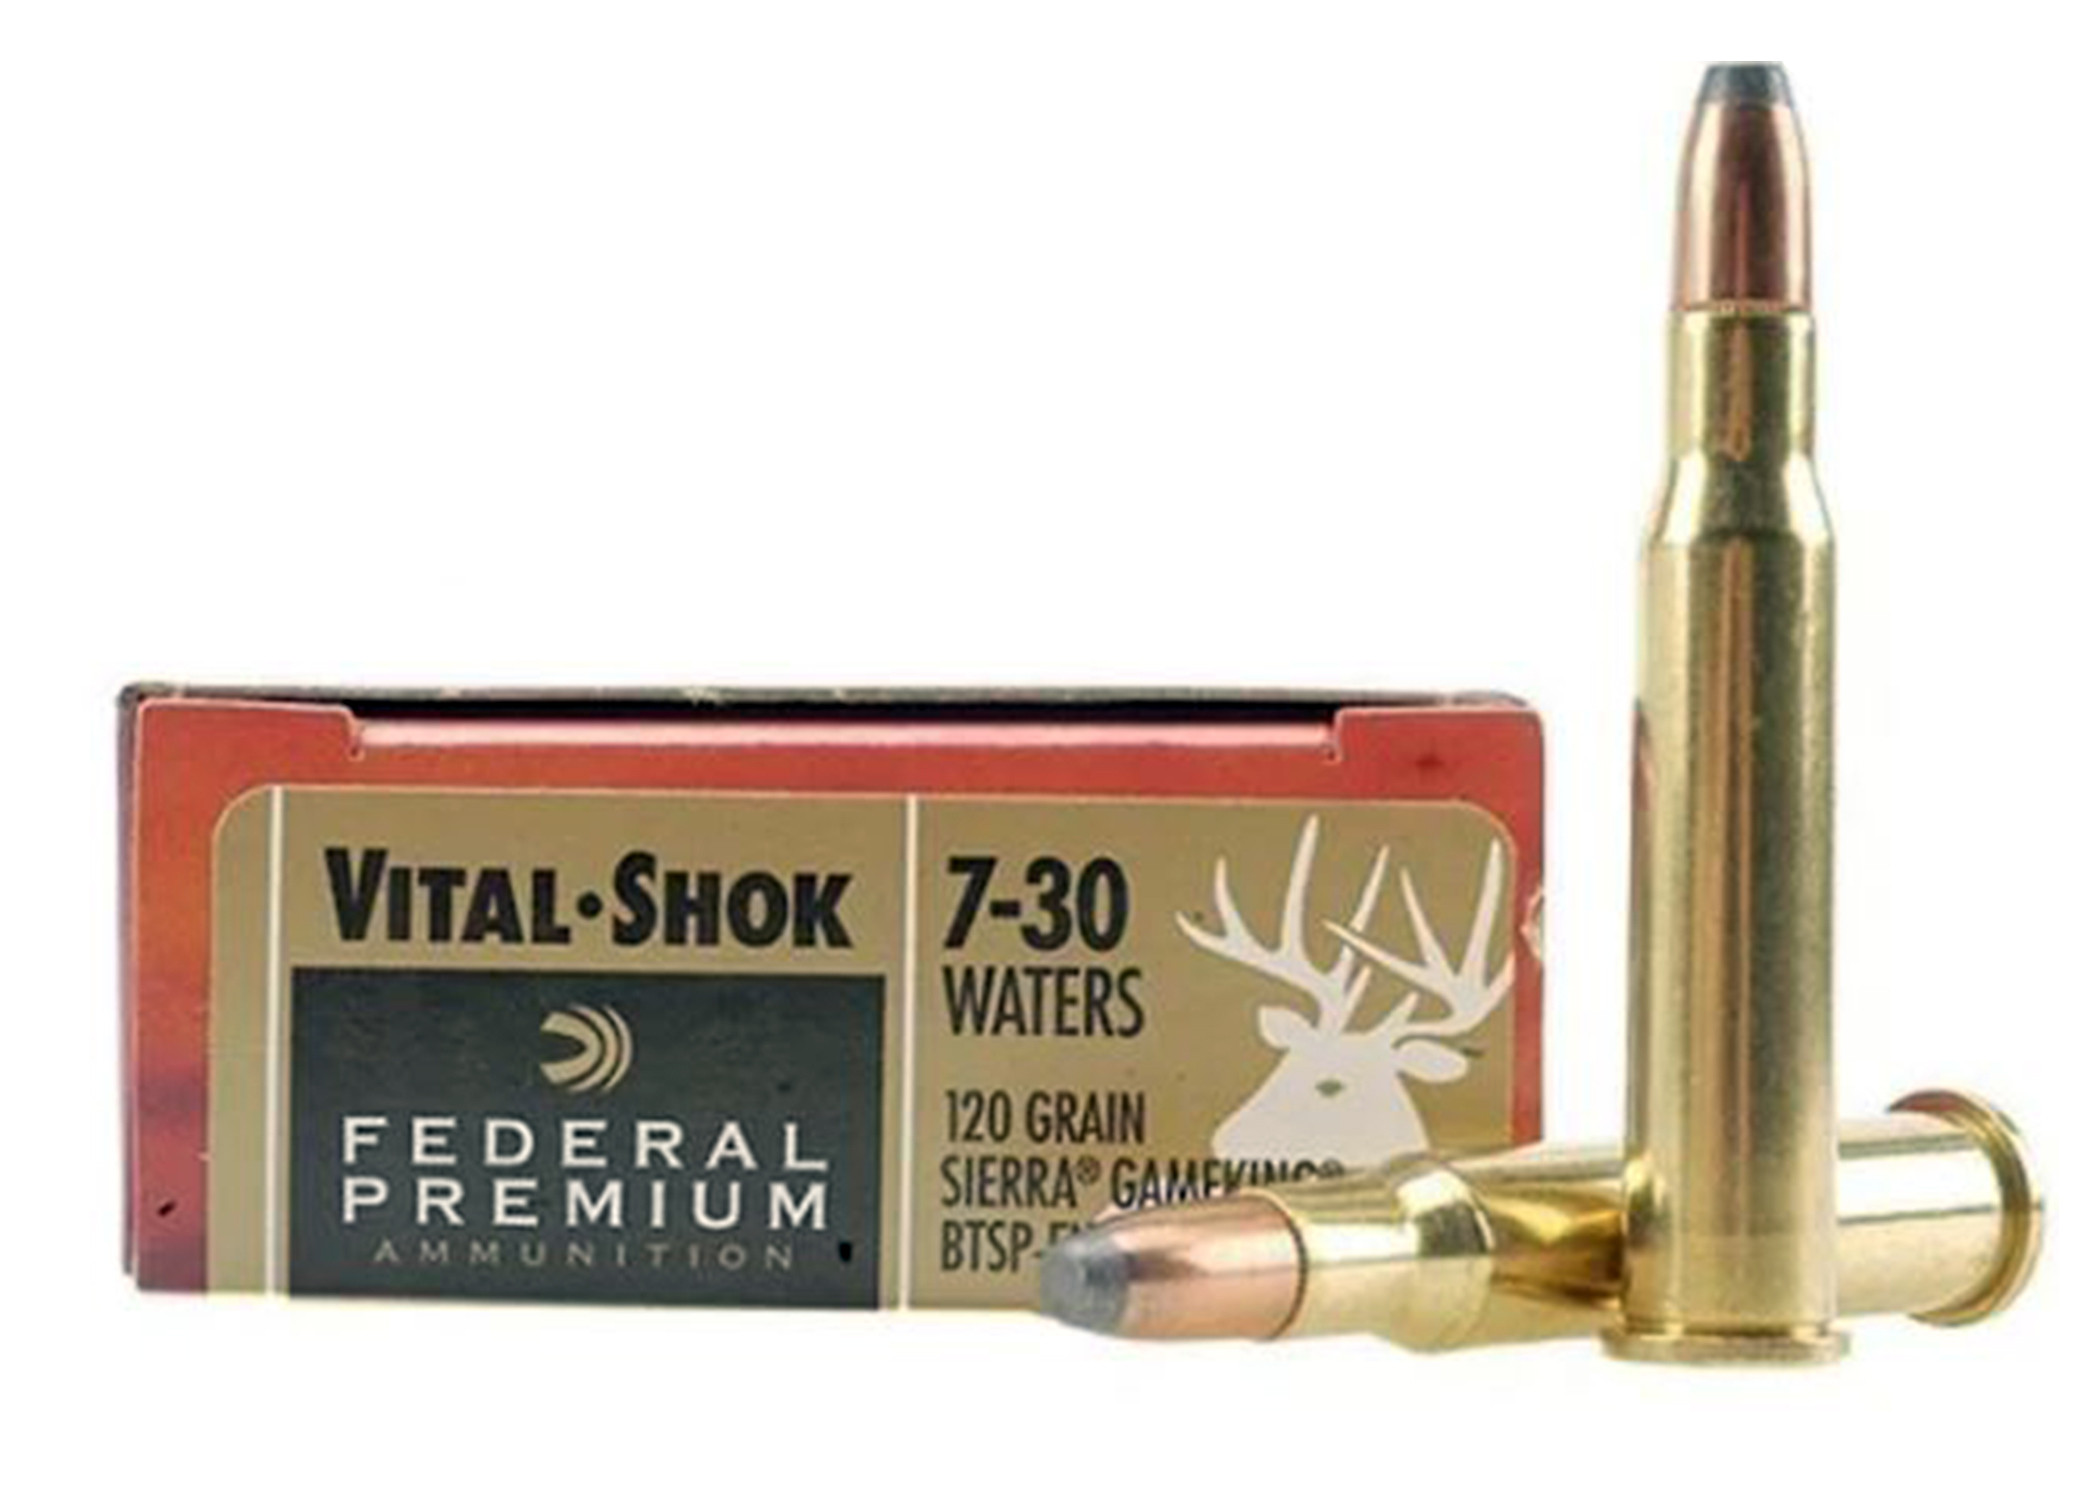 Federal Premium Ammunition, 7-30 Waters 120 Grain Sierra, GameKing Soft Point Boat Tail, Box of 20